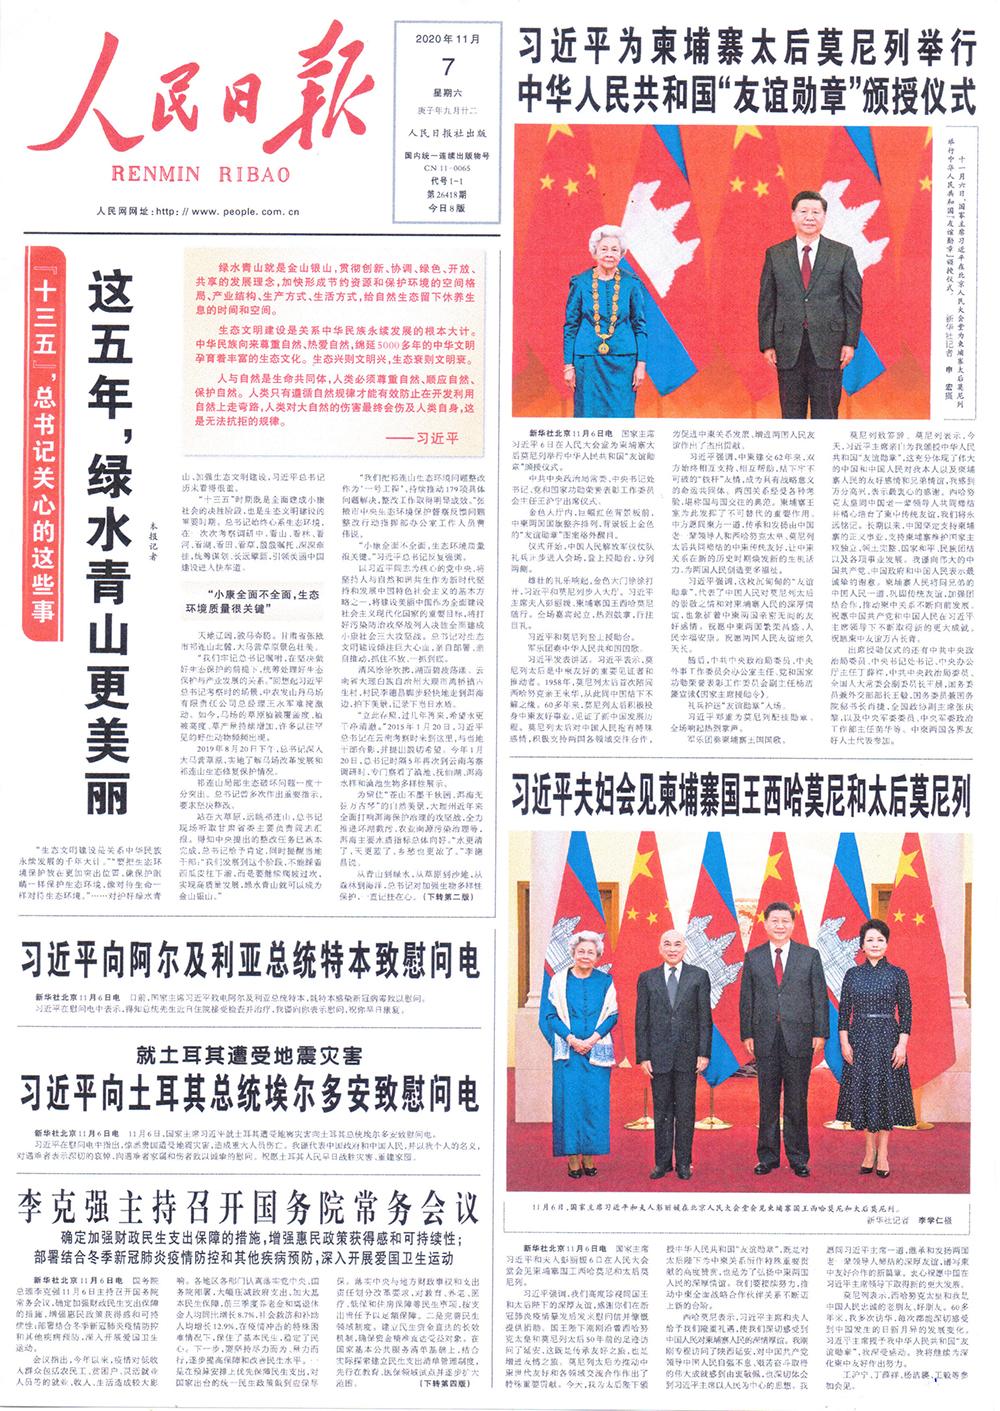 All/document/Documents/Presse/Internationale/id2361/001.jpg